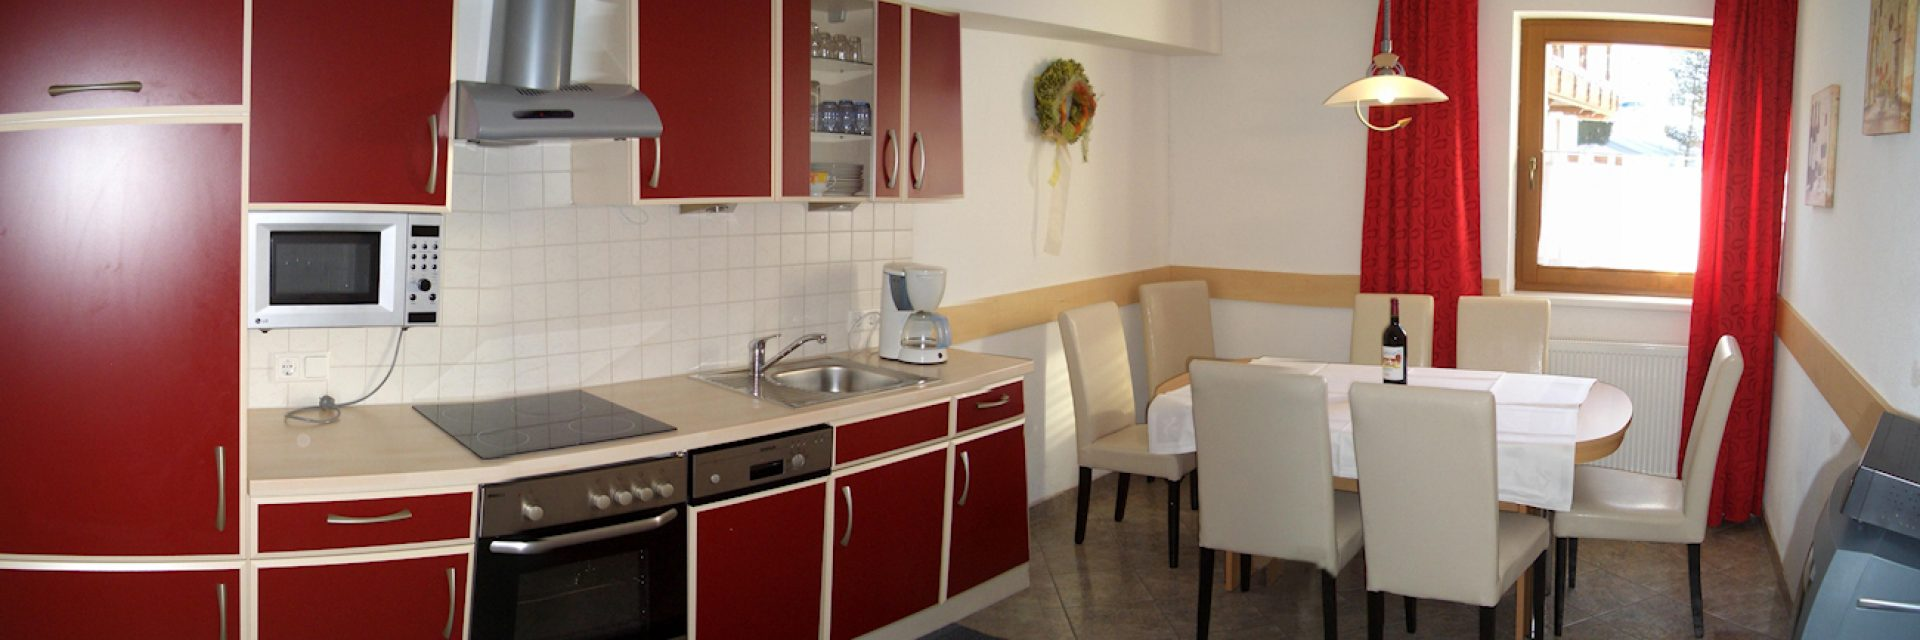 Appartement Hirner